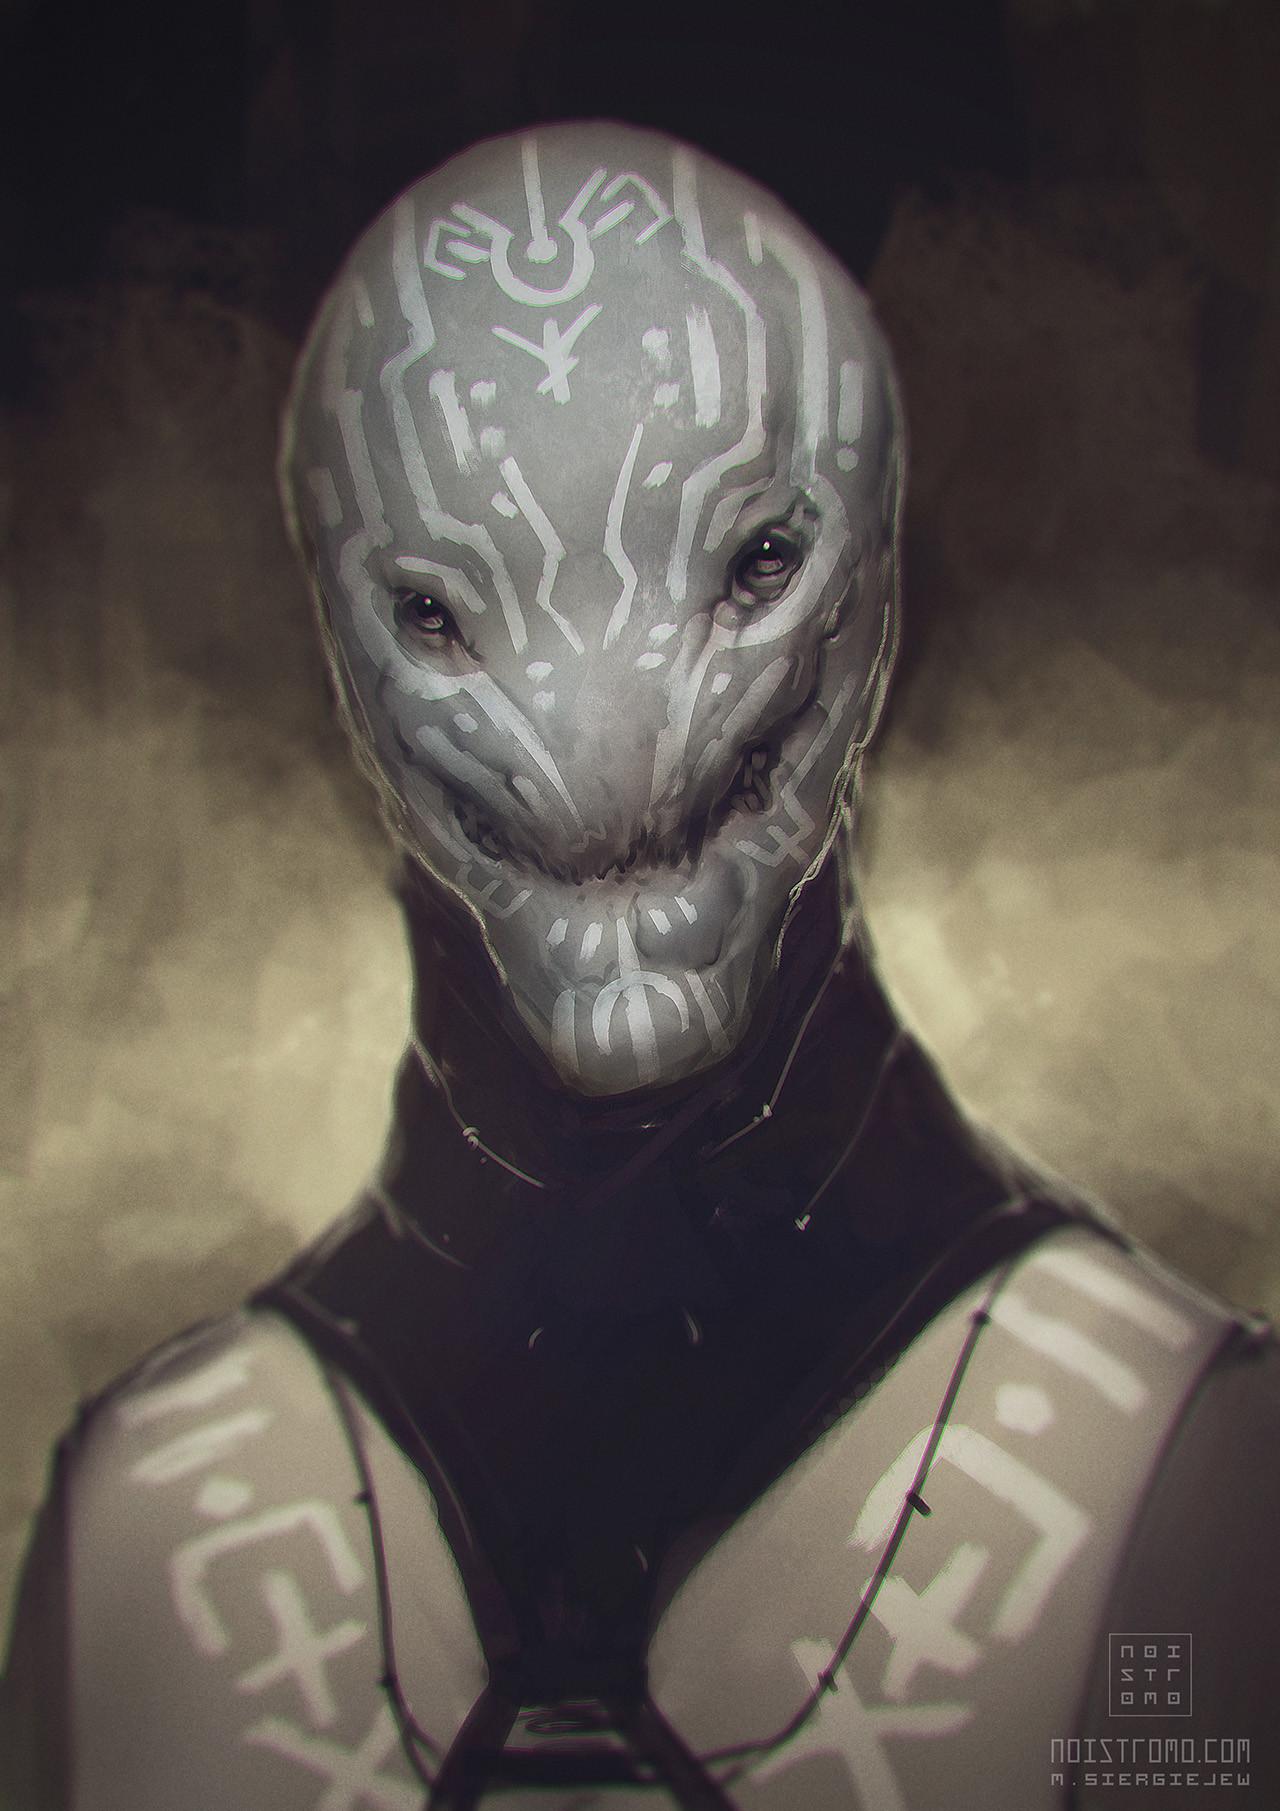 marius-siergiejew-alien-tribe-20170208-by-noistromo-x1811.png